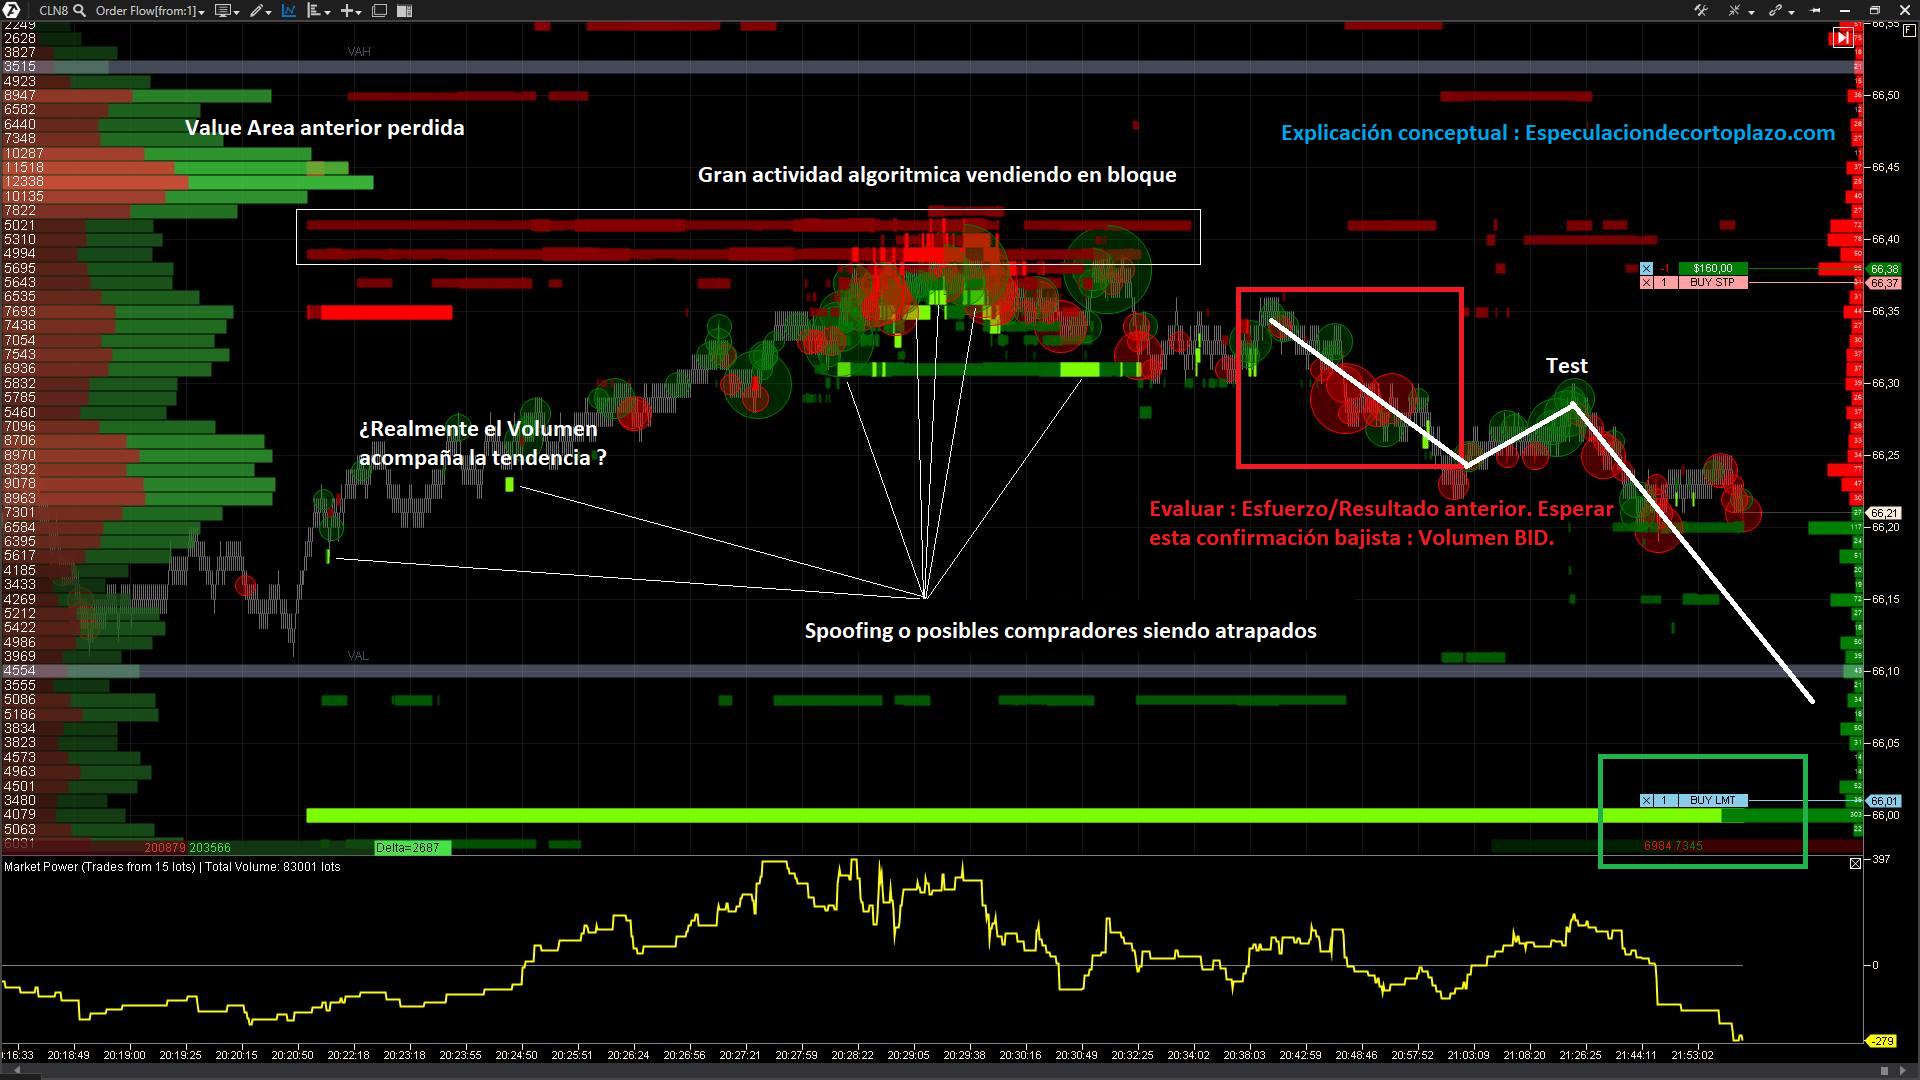 Order Book Trading | Liquidez | Maket Data - Enric Jaimez